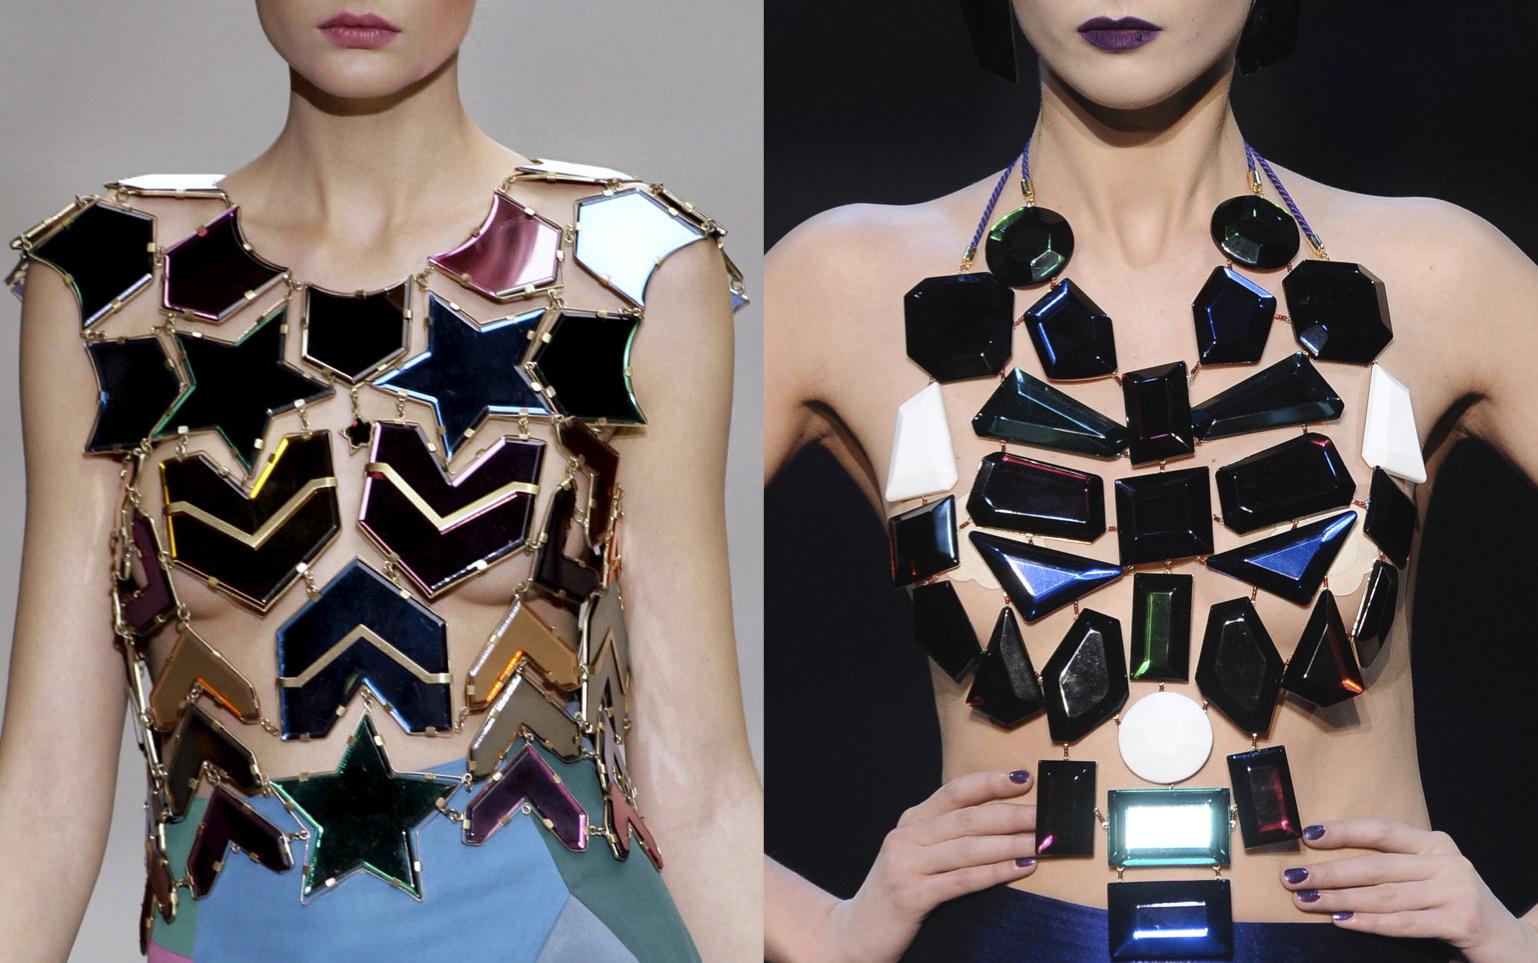 http://4.bp.blogspot.com/-HFtAooRDJTs/TpBONyq-lBI/AAAAAAAACQg/7fT2-CXPrHA/s1600/latest-jewellery-trends.jpg